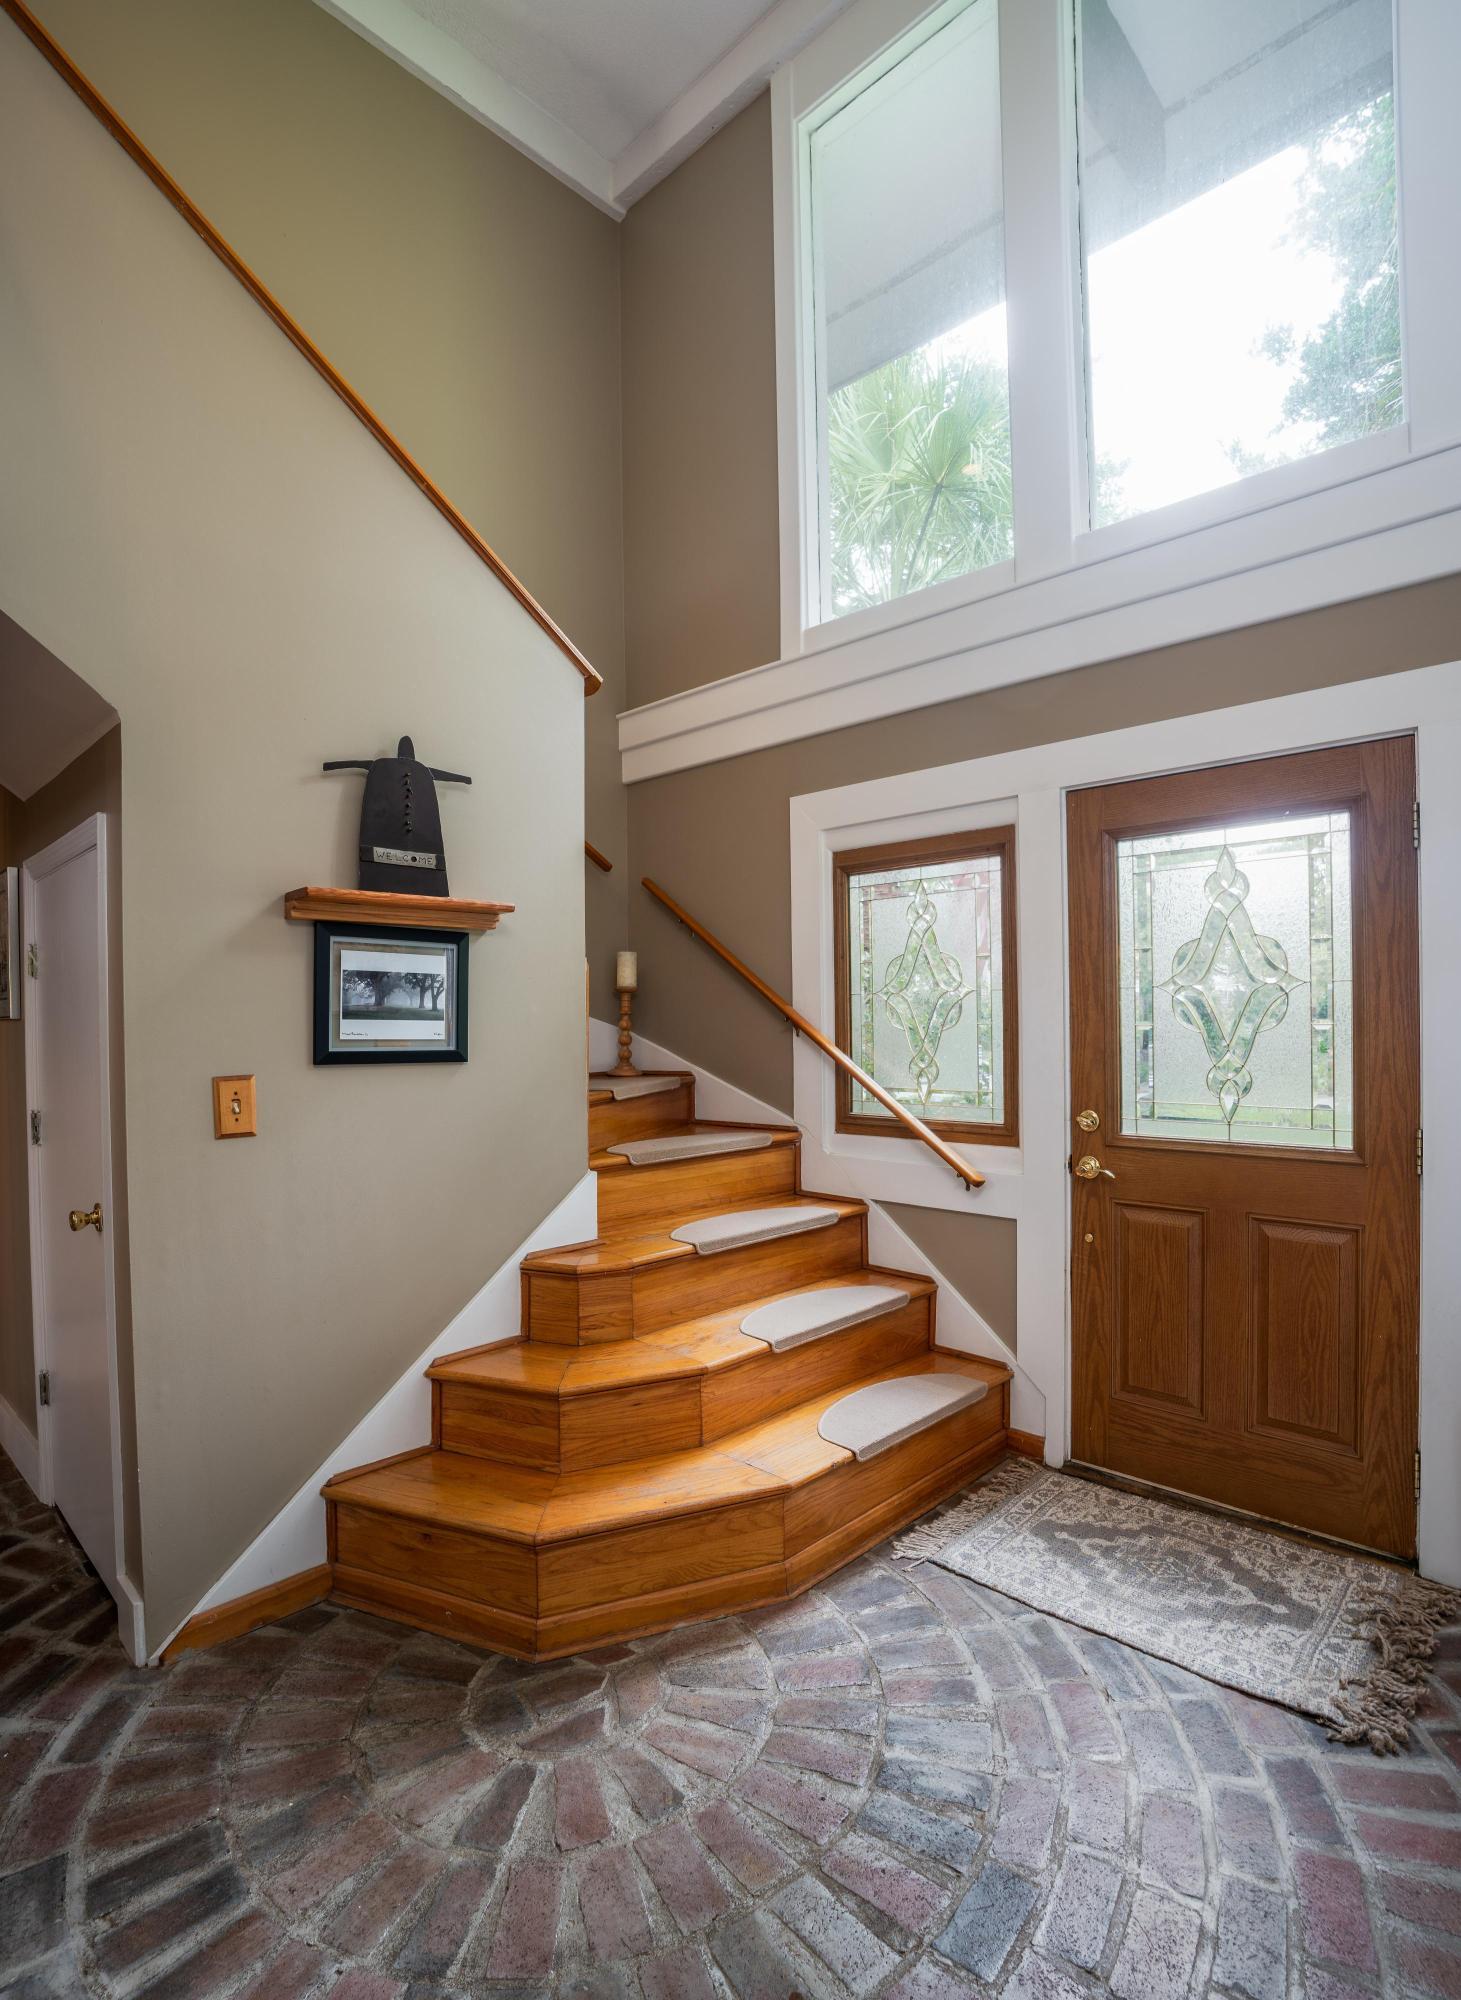 White Point Estates Homes For Sale - 894 White Point, Charleston, SC - 36